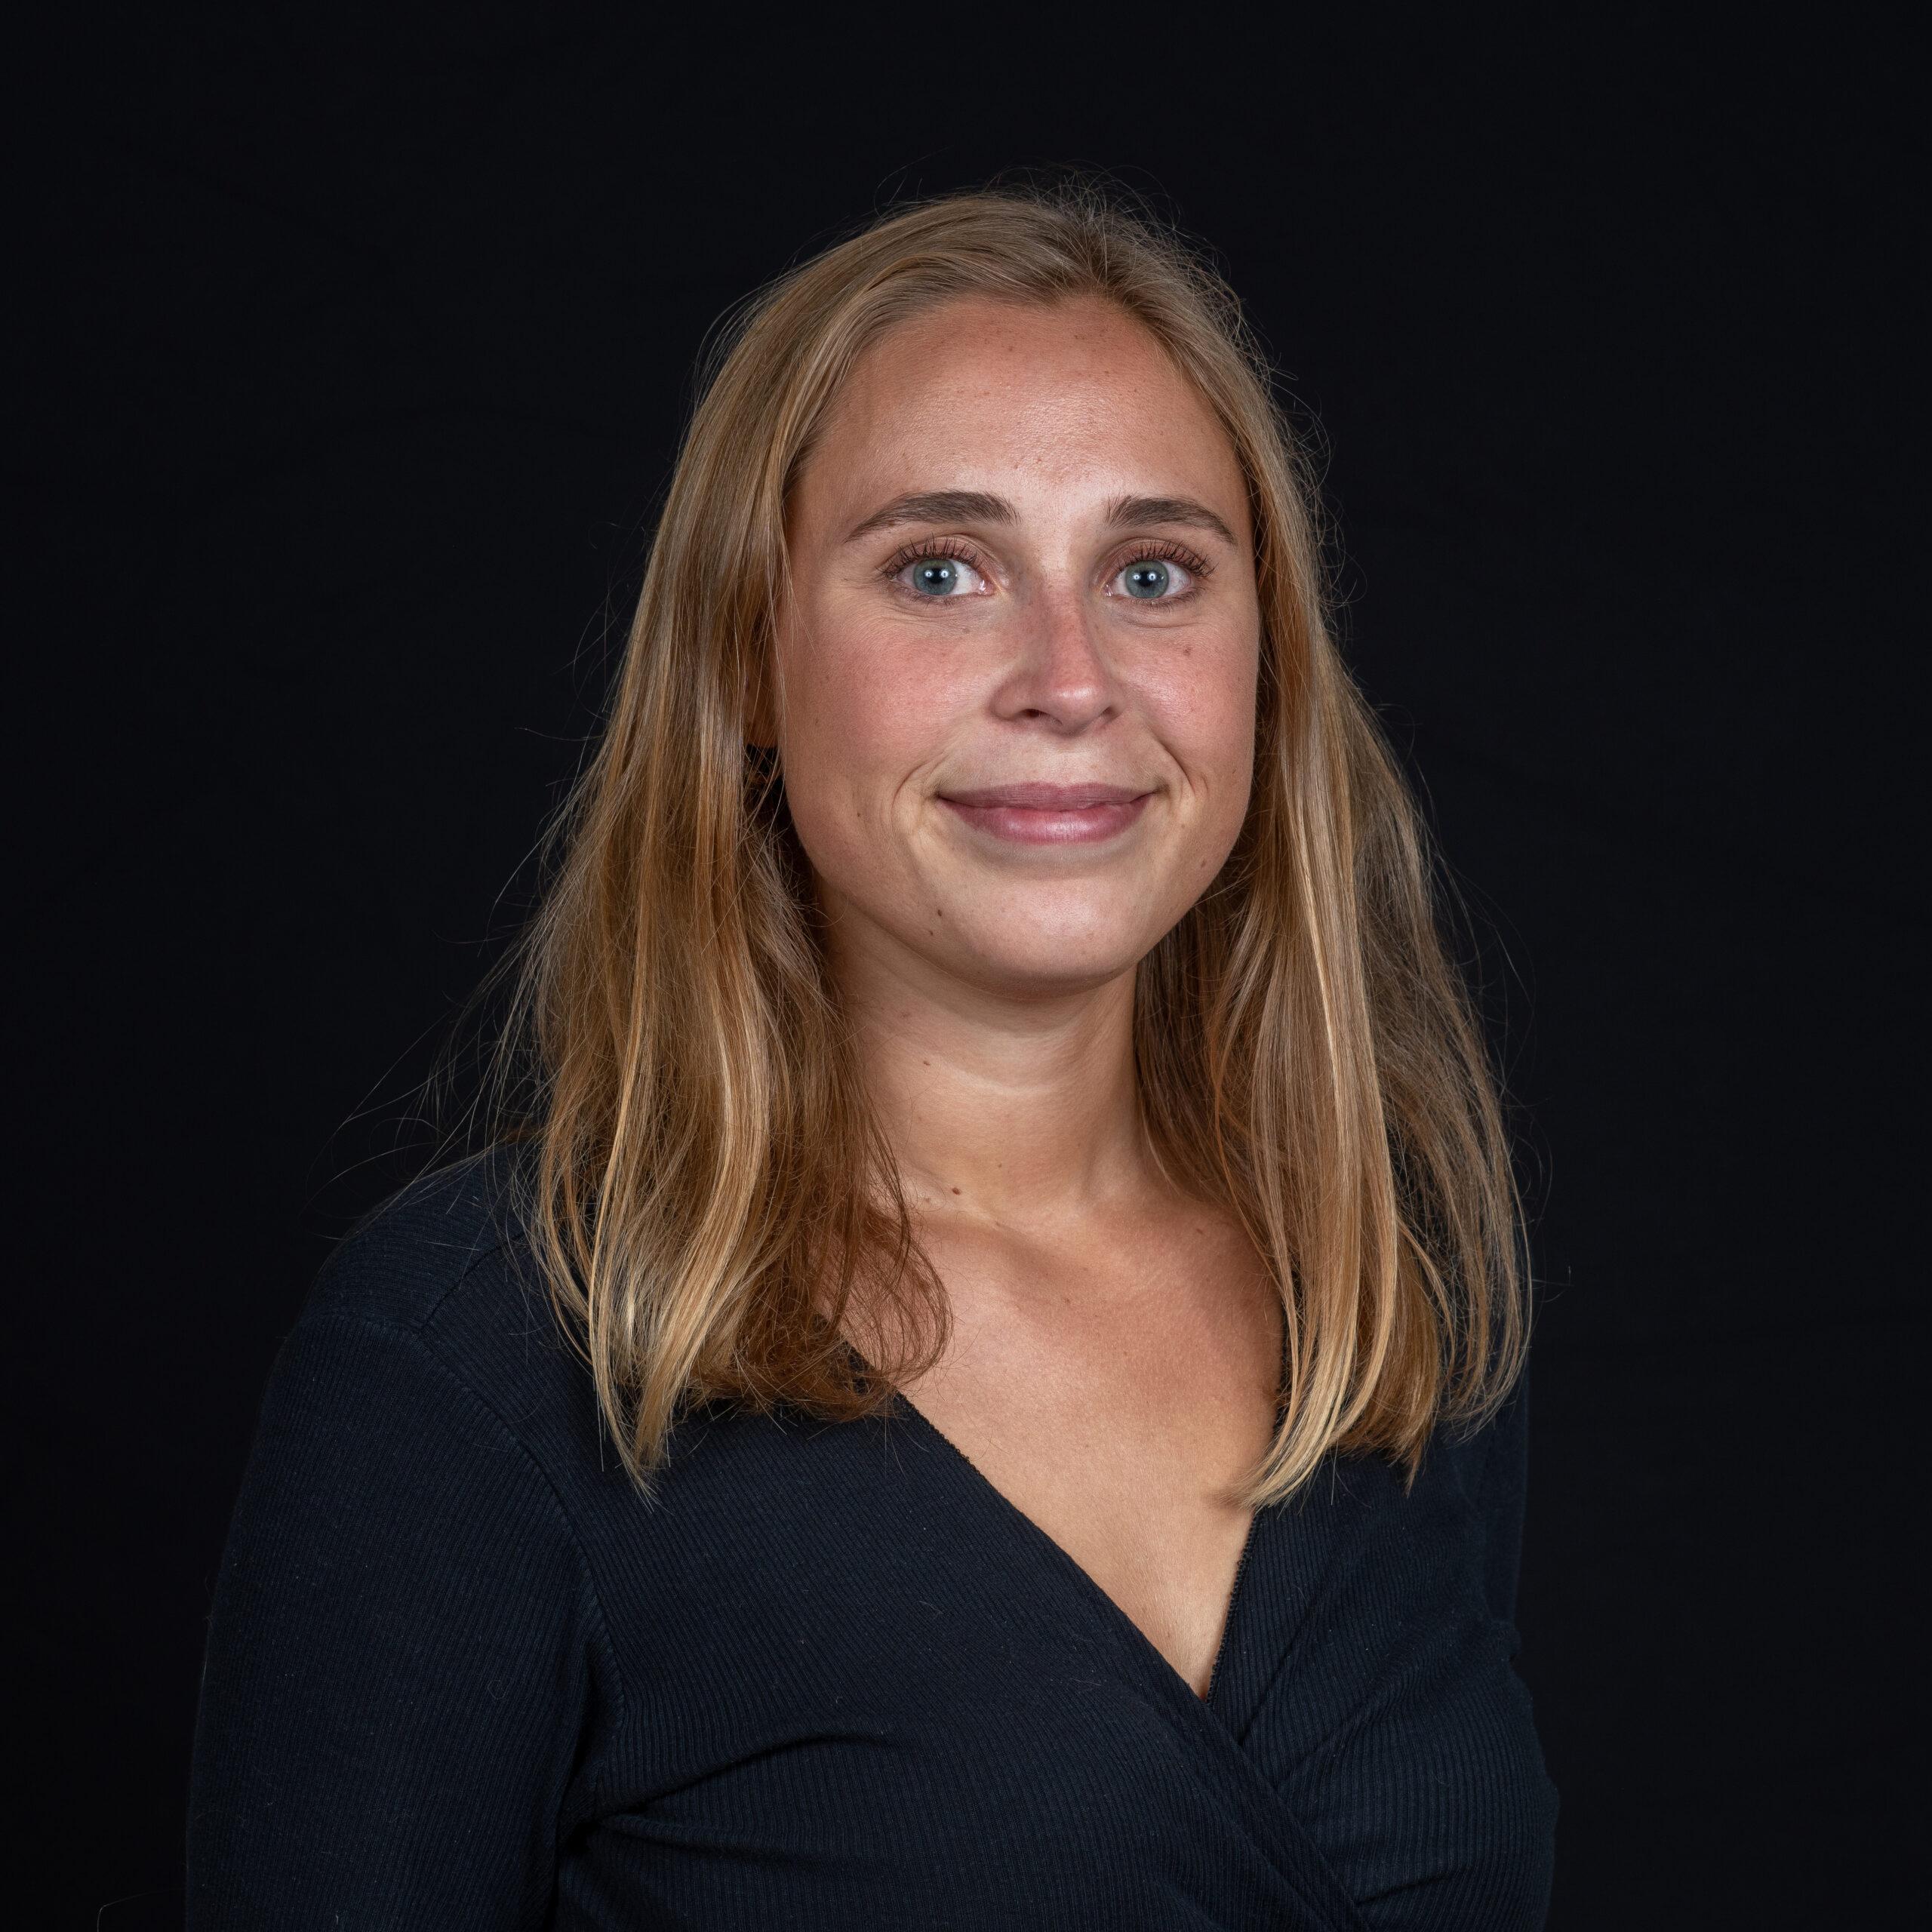 Christine Nabe-Nielsen